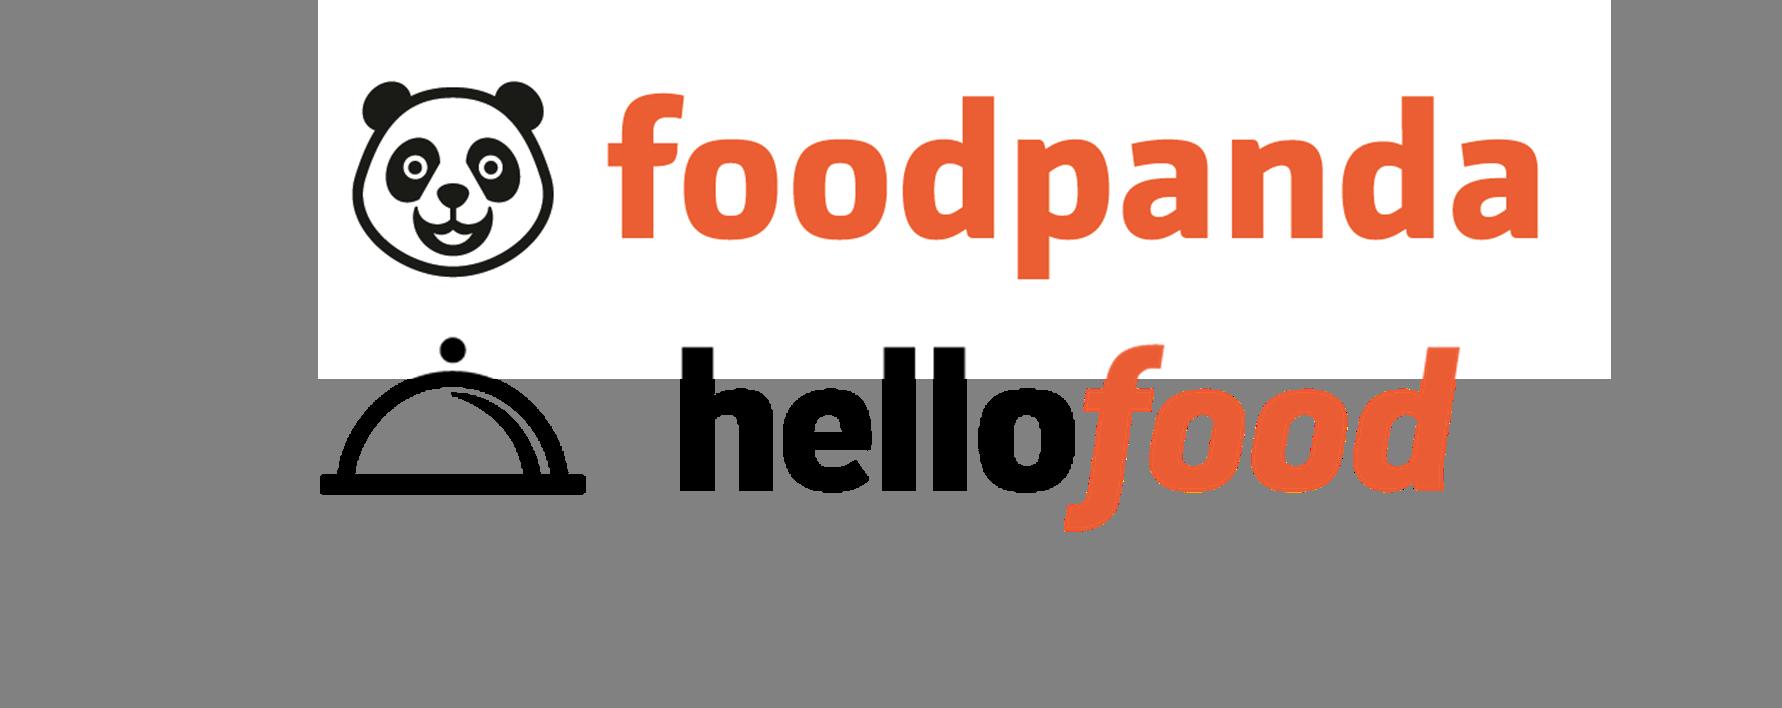 Foodpanda_hellofood_new_logo